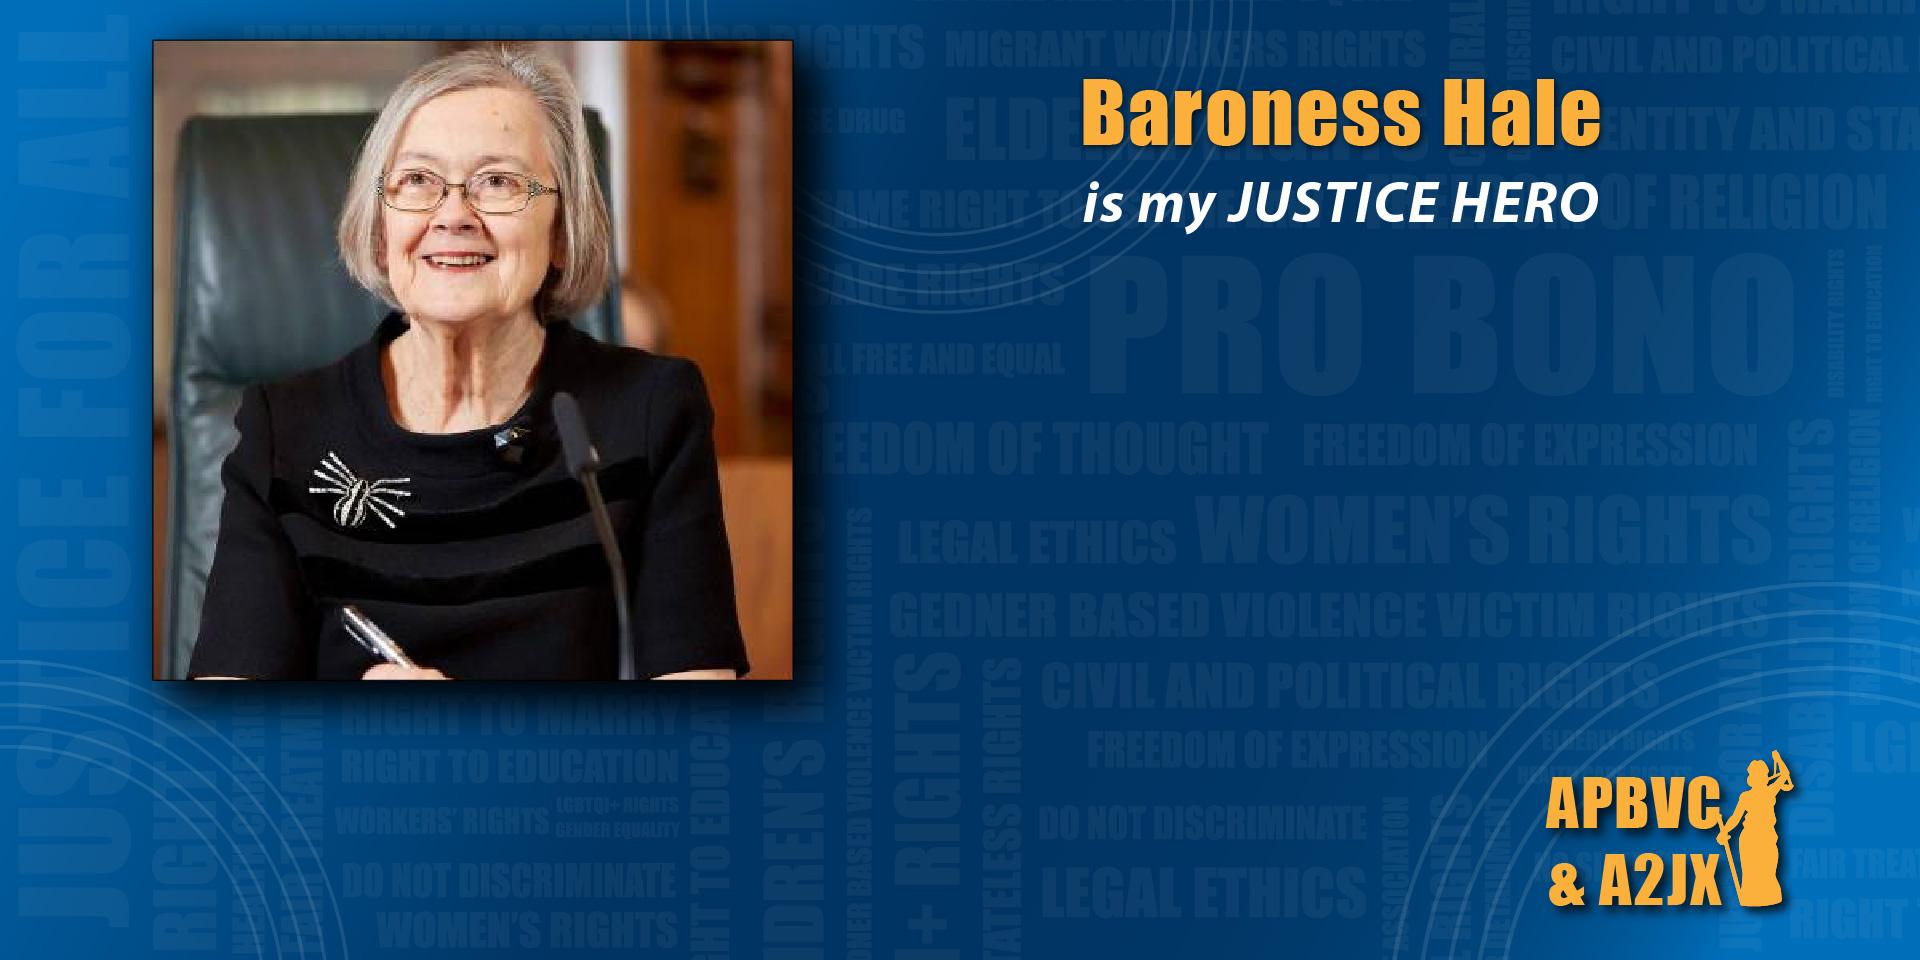 Baroness Hale